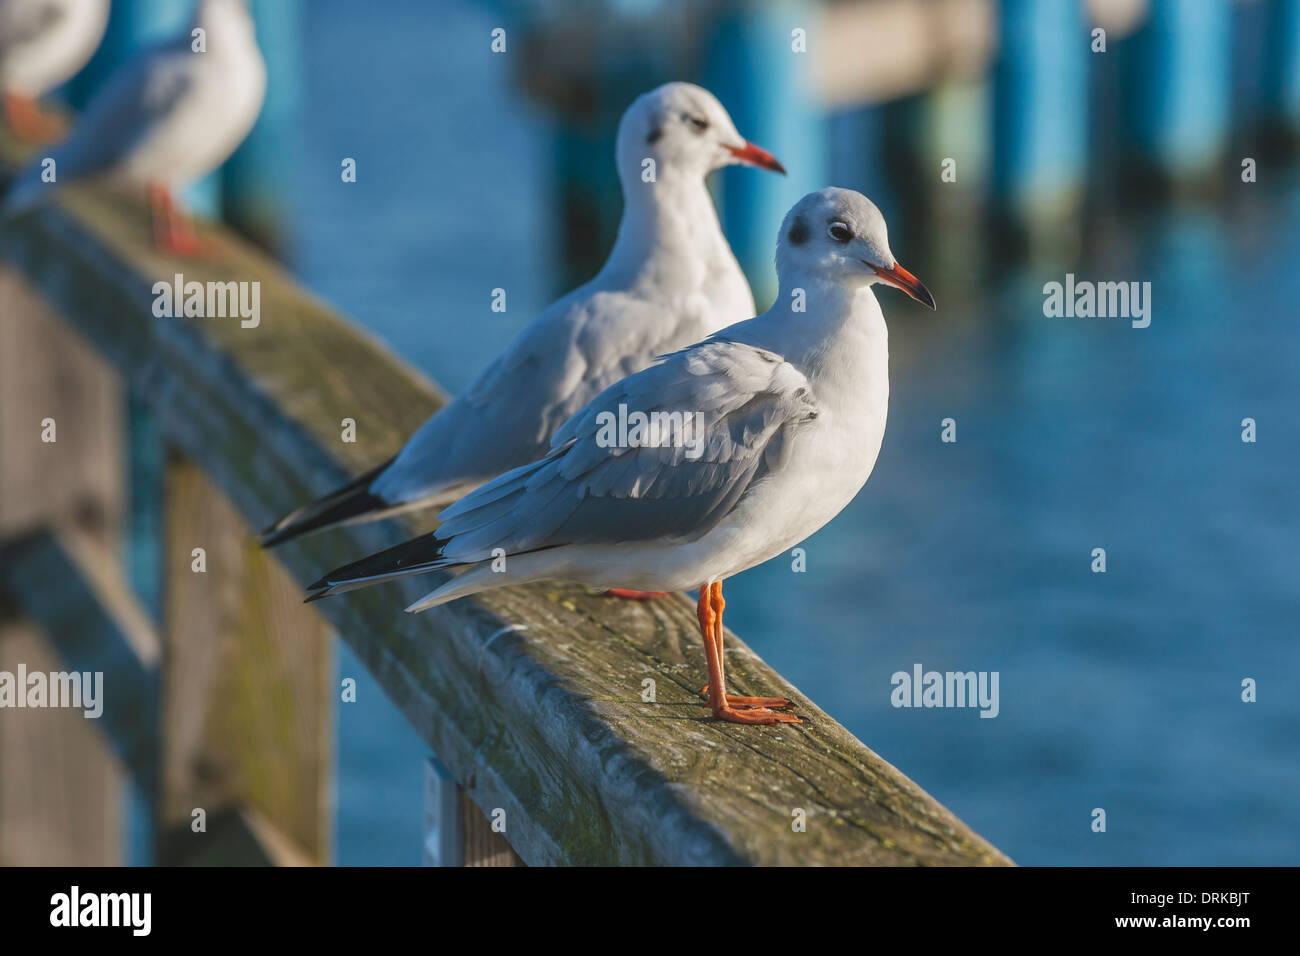 Detail photo of Black-headed Gulls in winter plumage, Mecklenburg-Western Pomerania, Germany, Europe - Stock Image